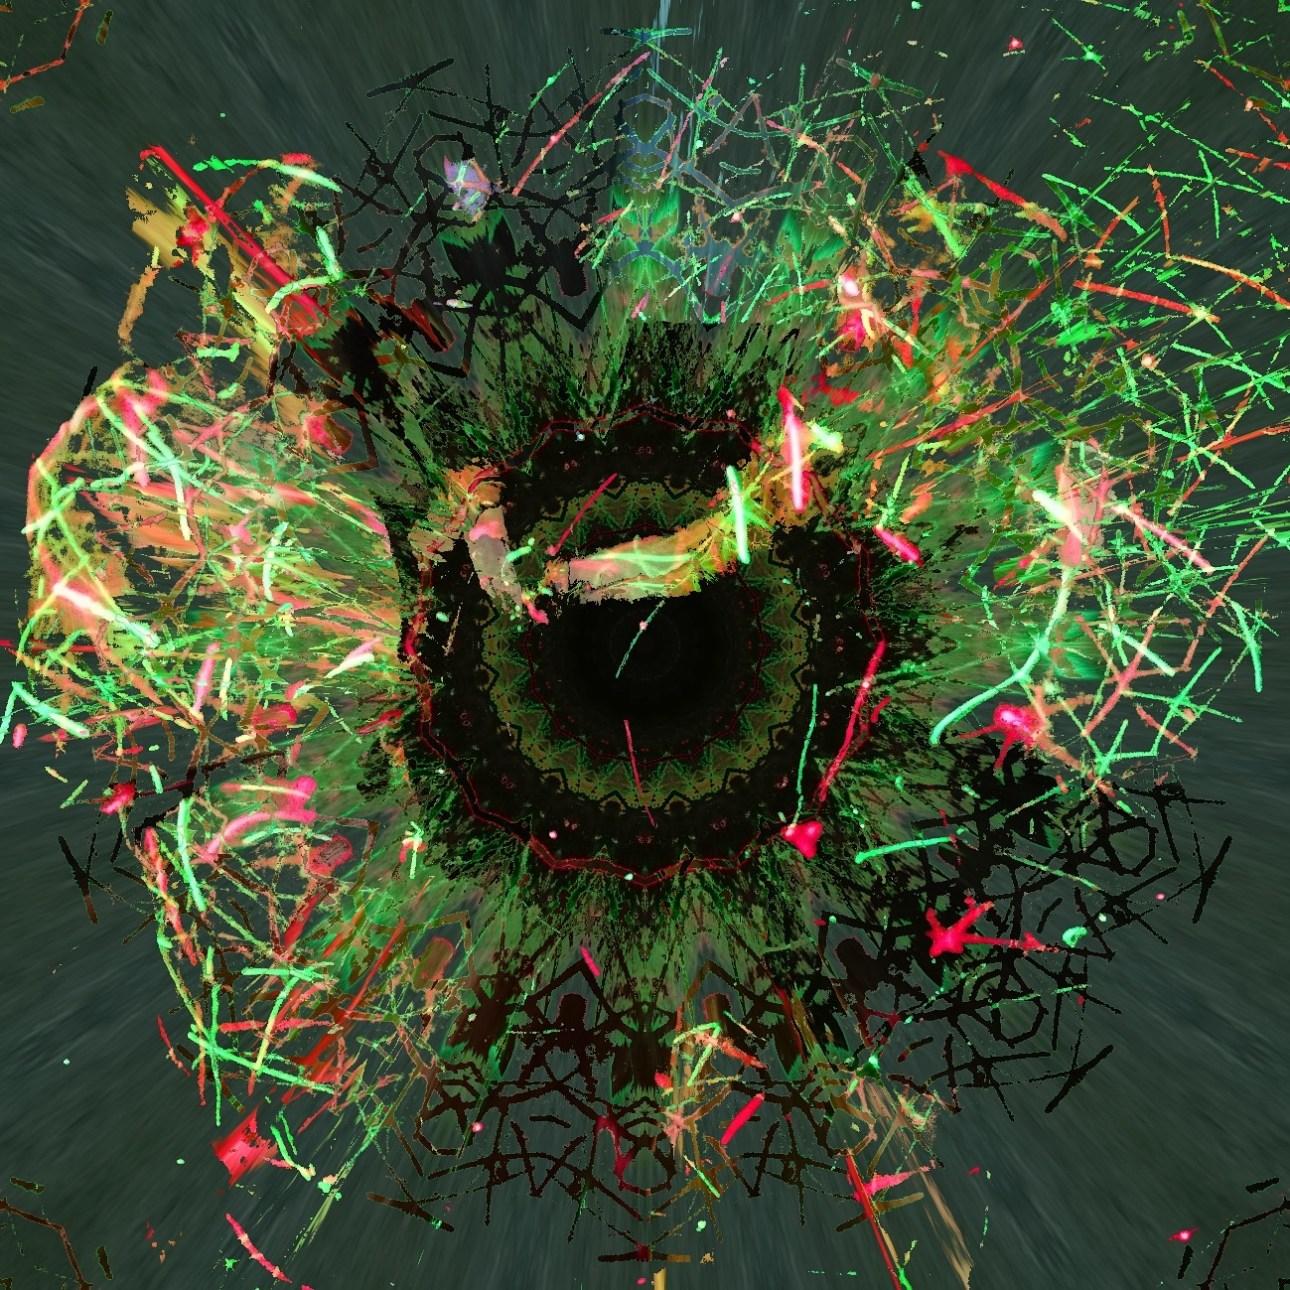 Kalidoscopic Green Eye Explosion glitch art